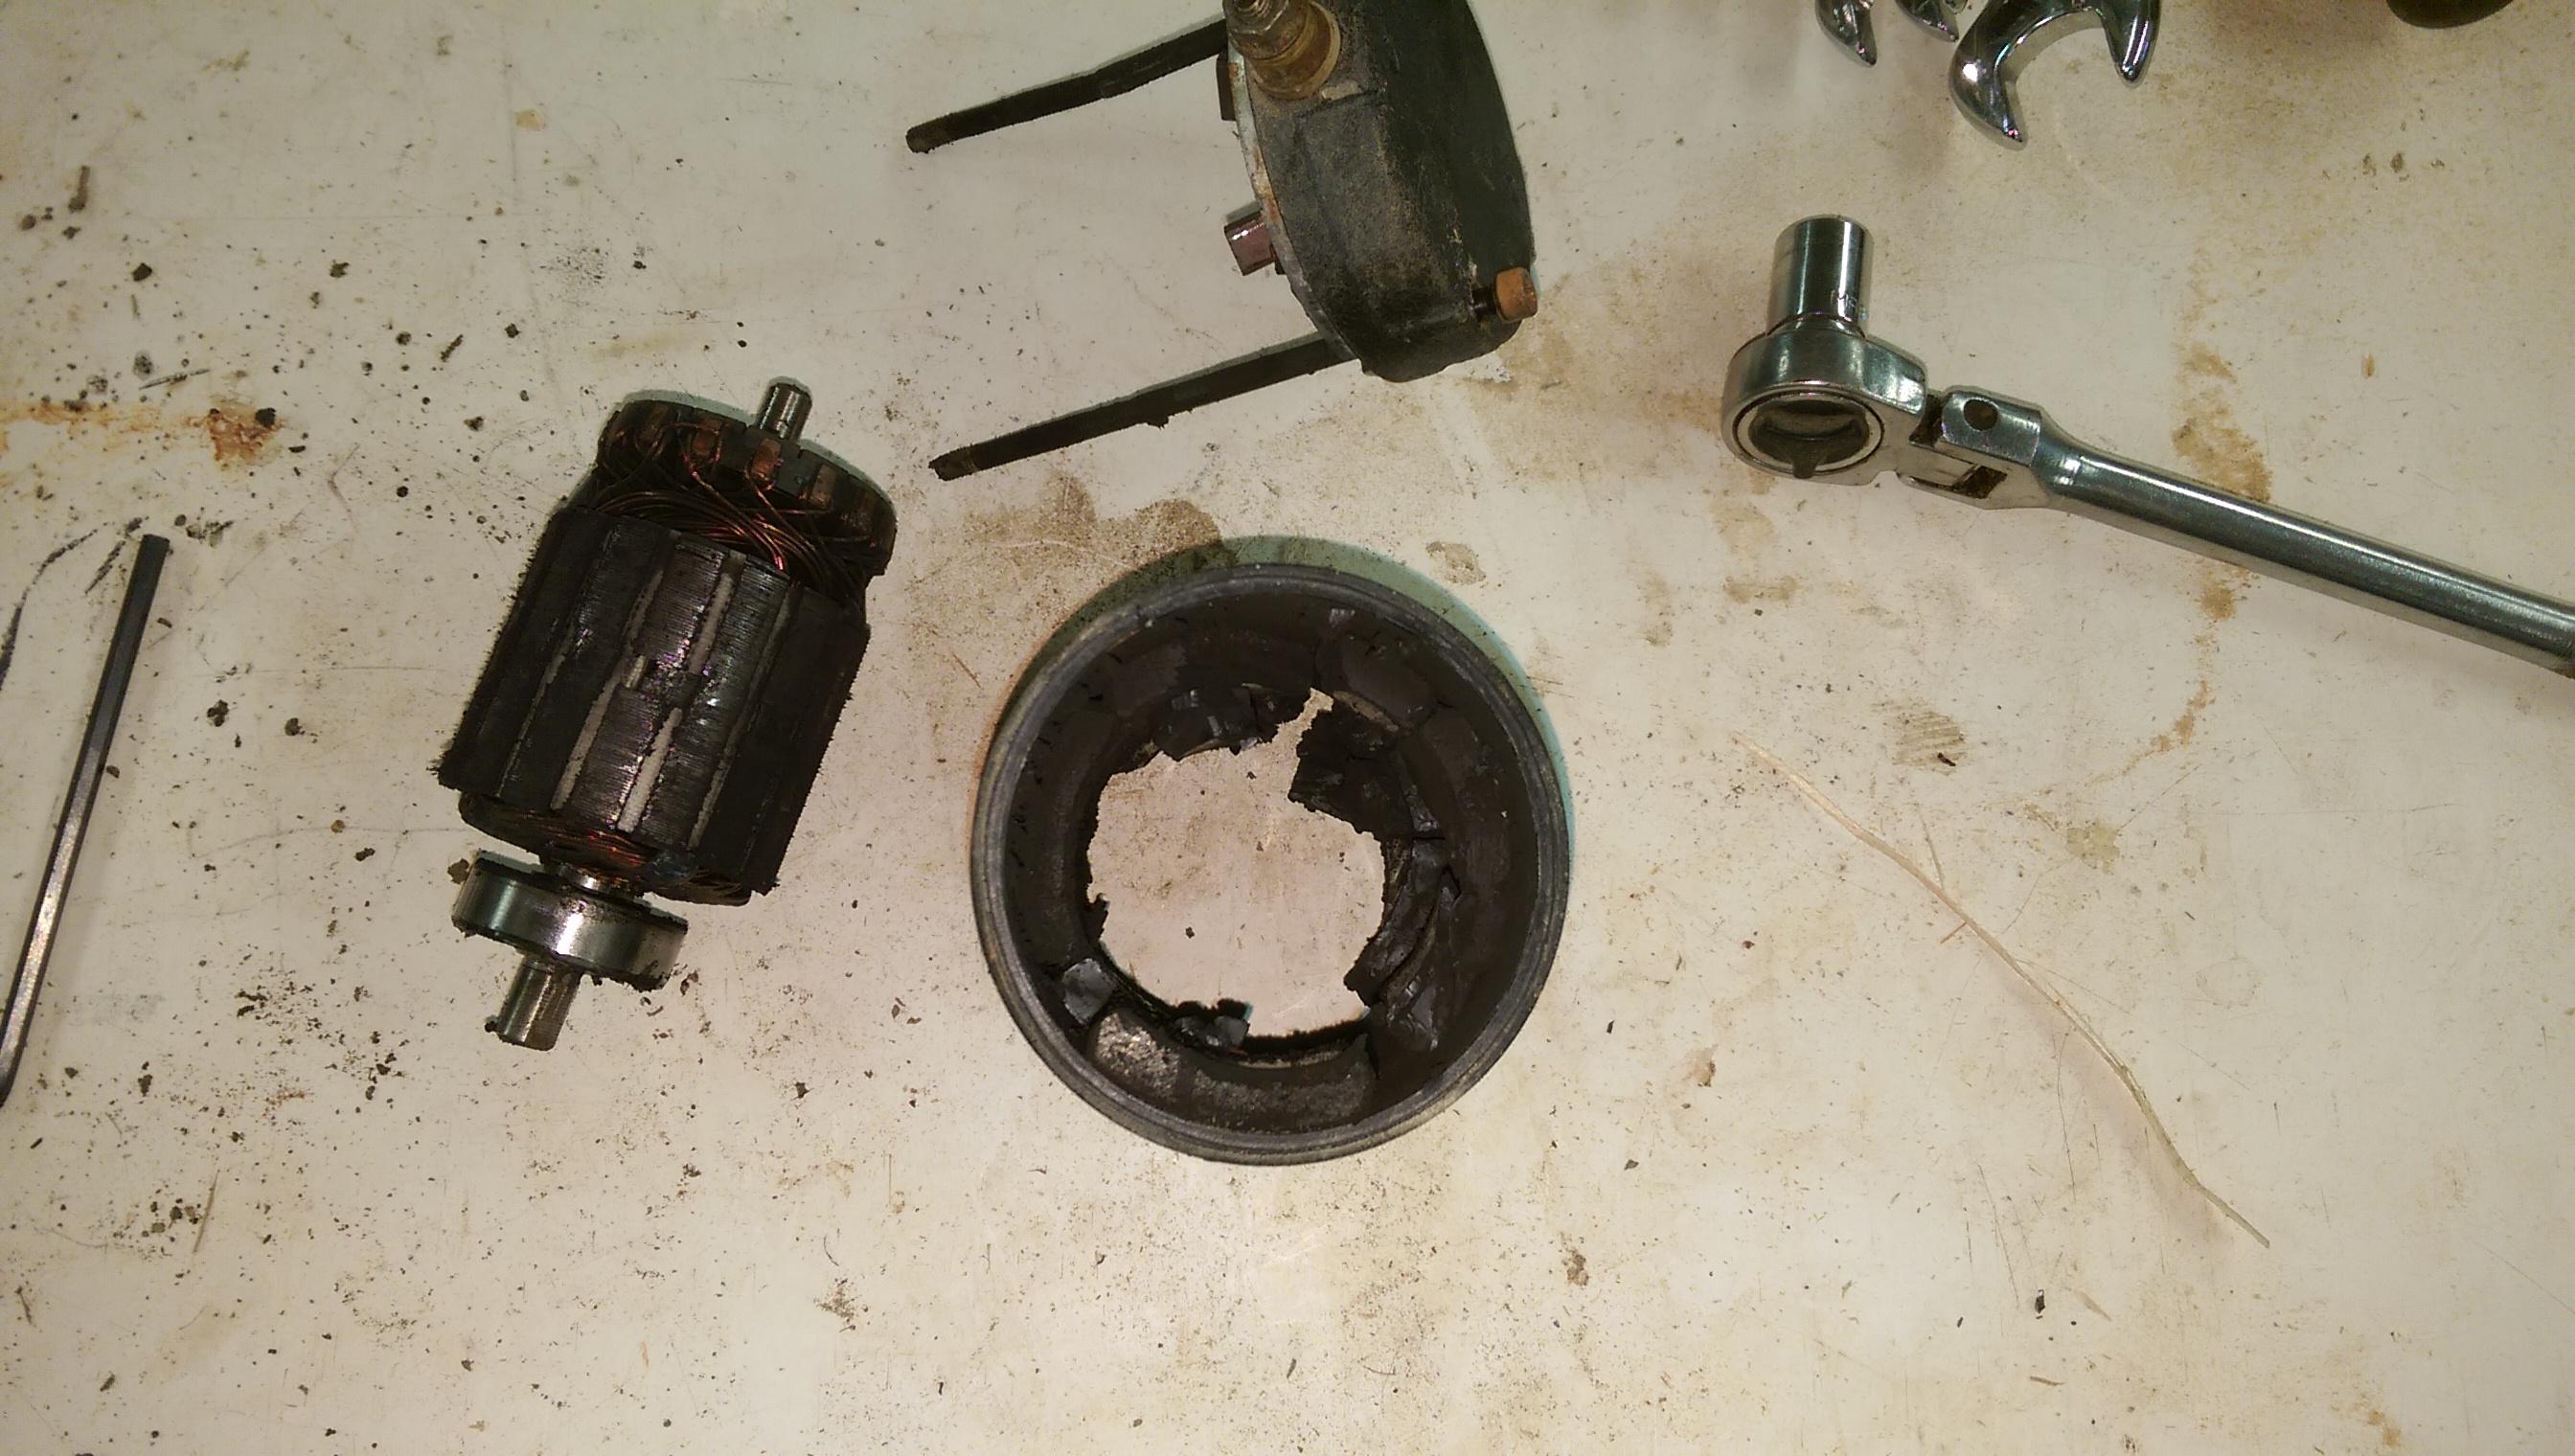 Polaris 3500 Winch Problems Solenoid Wiring Diagram Fail Atv Forum Rh Polarisatvforums Com Parts Breakdown